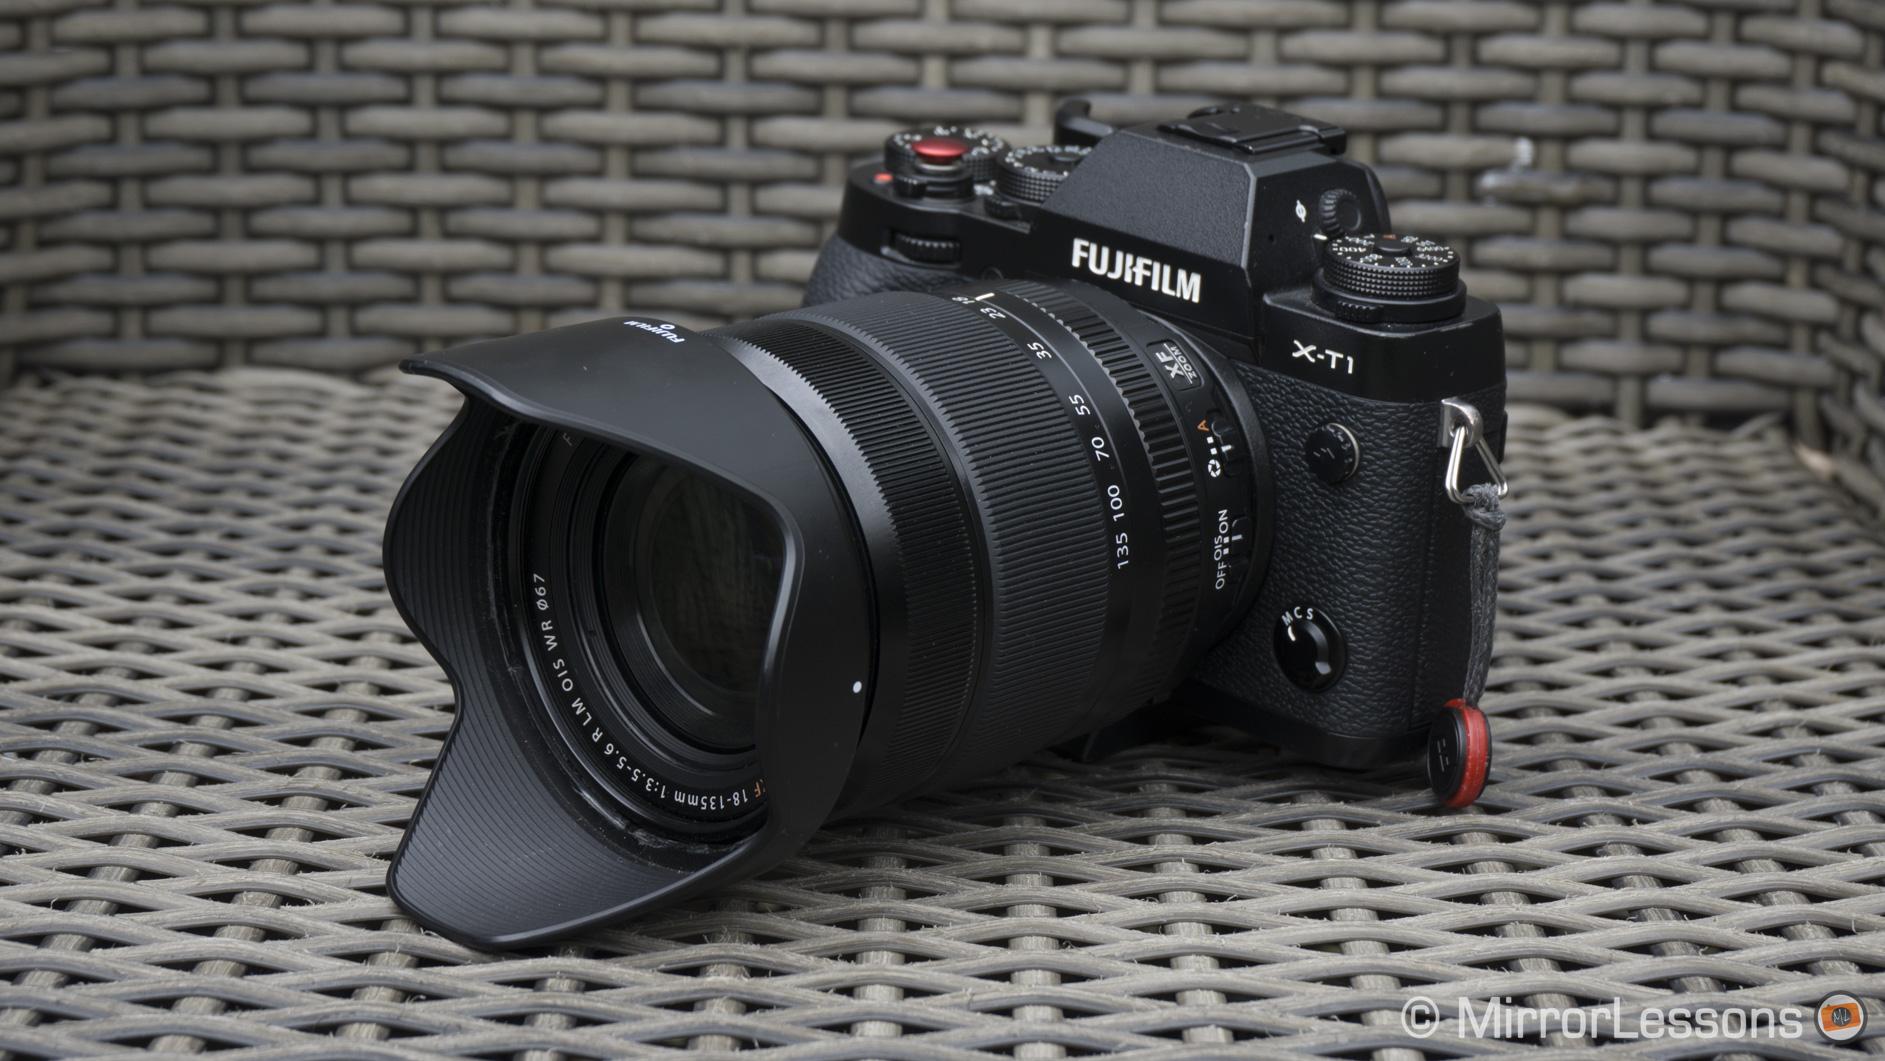 fujifilm 18-135mm review